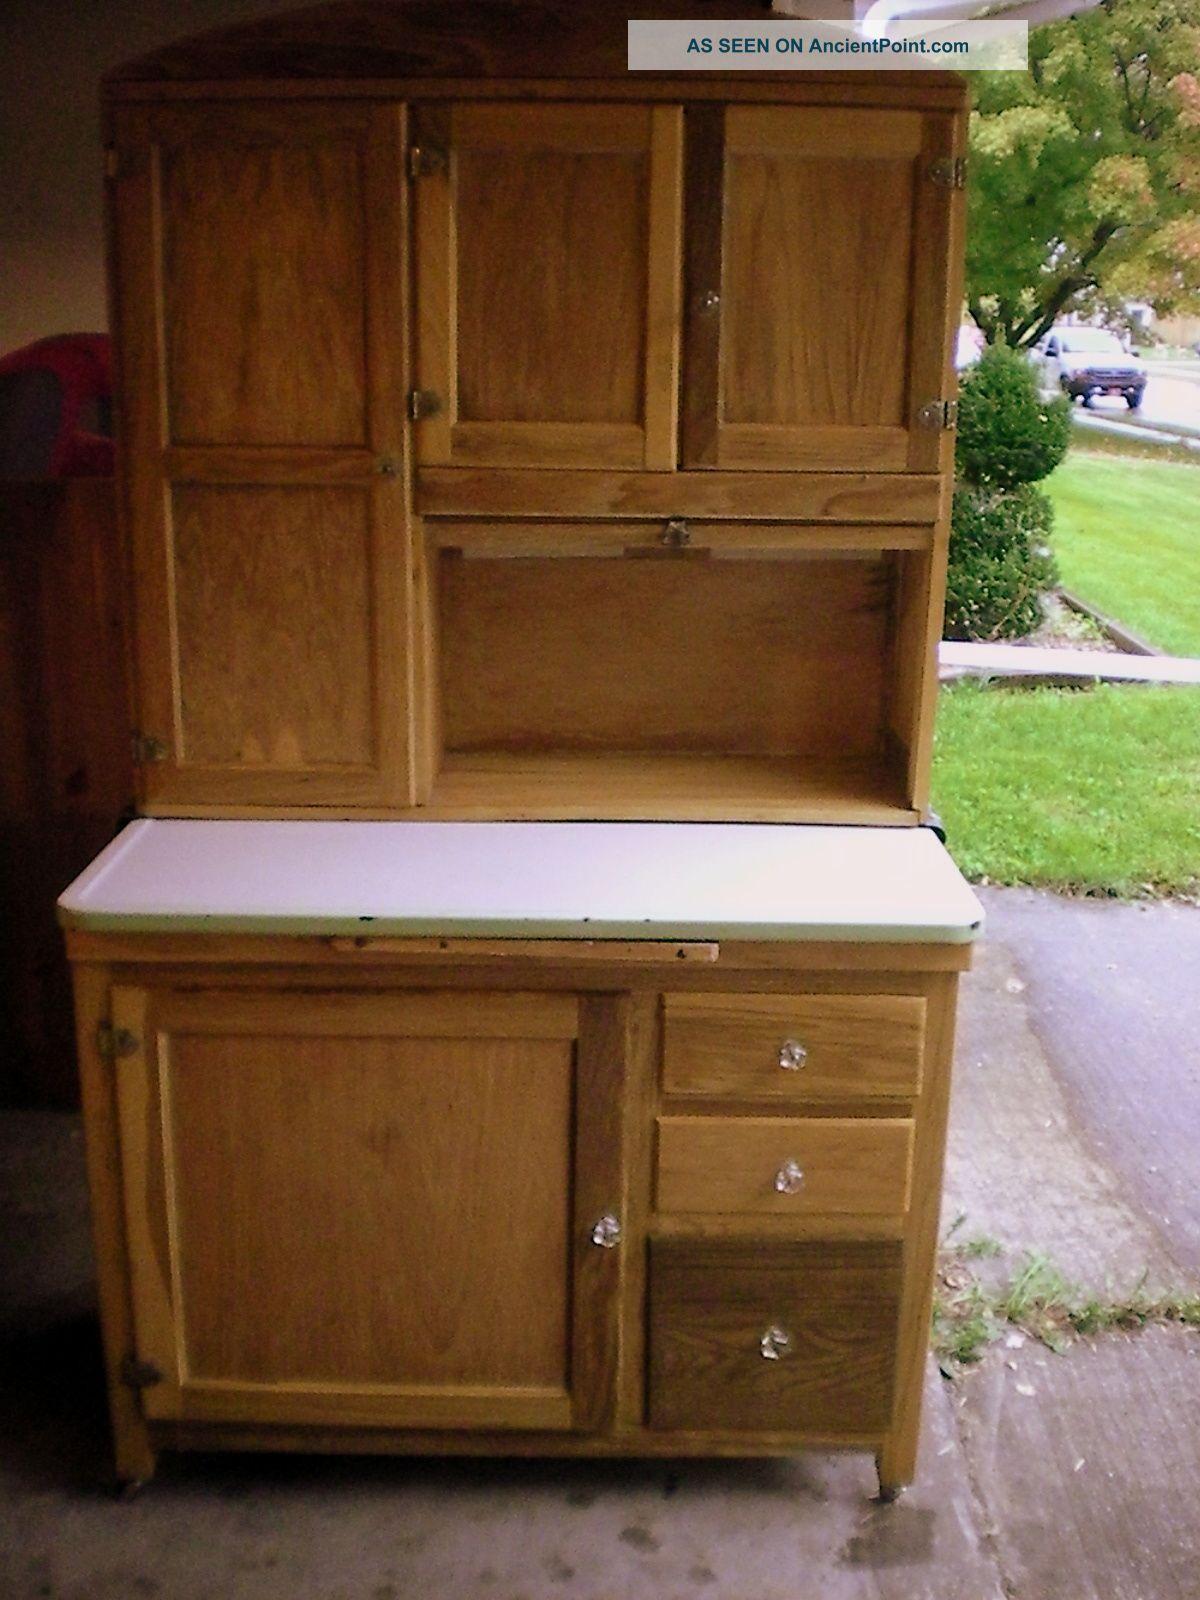 Vintage wood kitchen cabinets antique kitchen cabinets with flour bin antiqued kitchen cabinets pictures and photos antique kitchen pantry antique kitchen